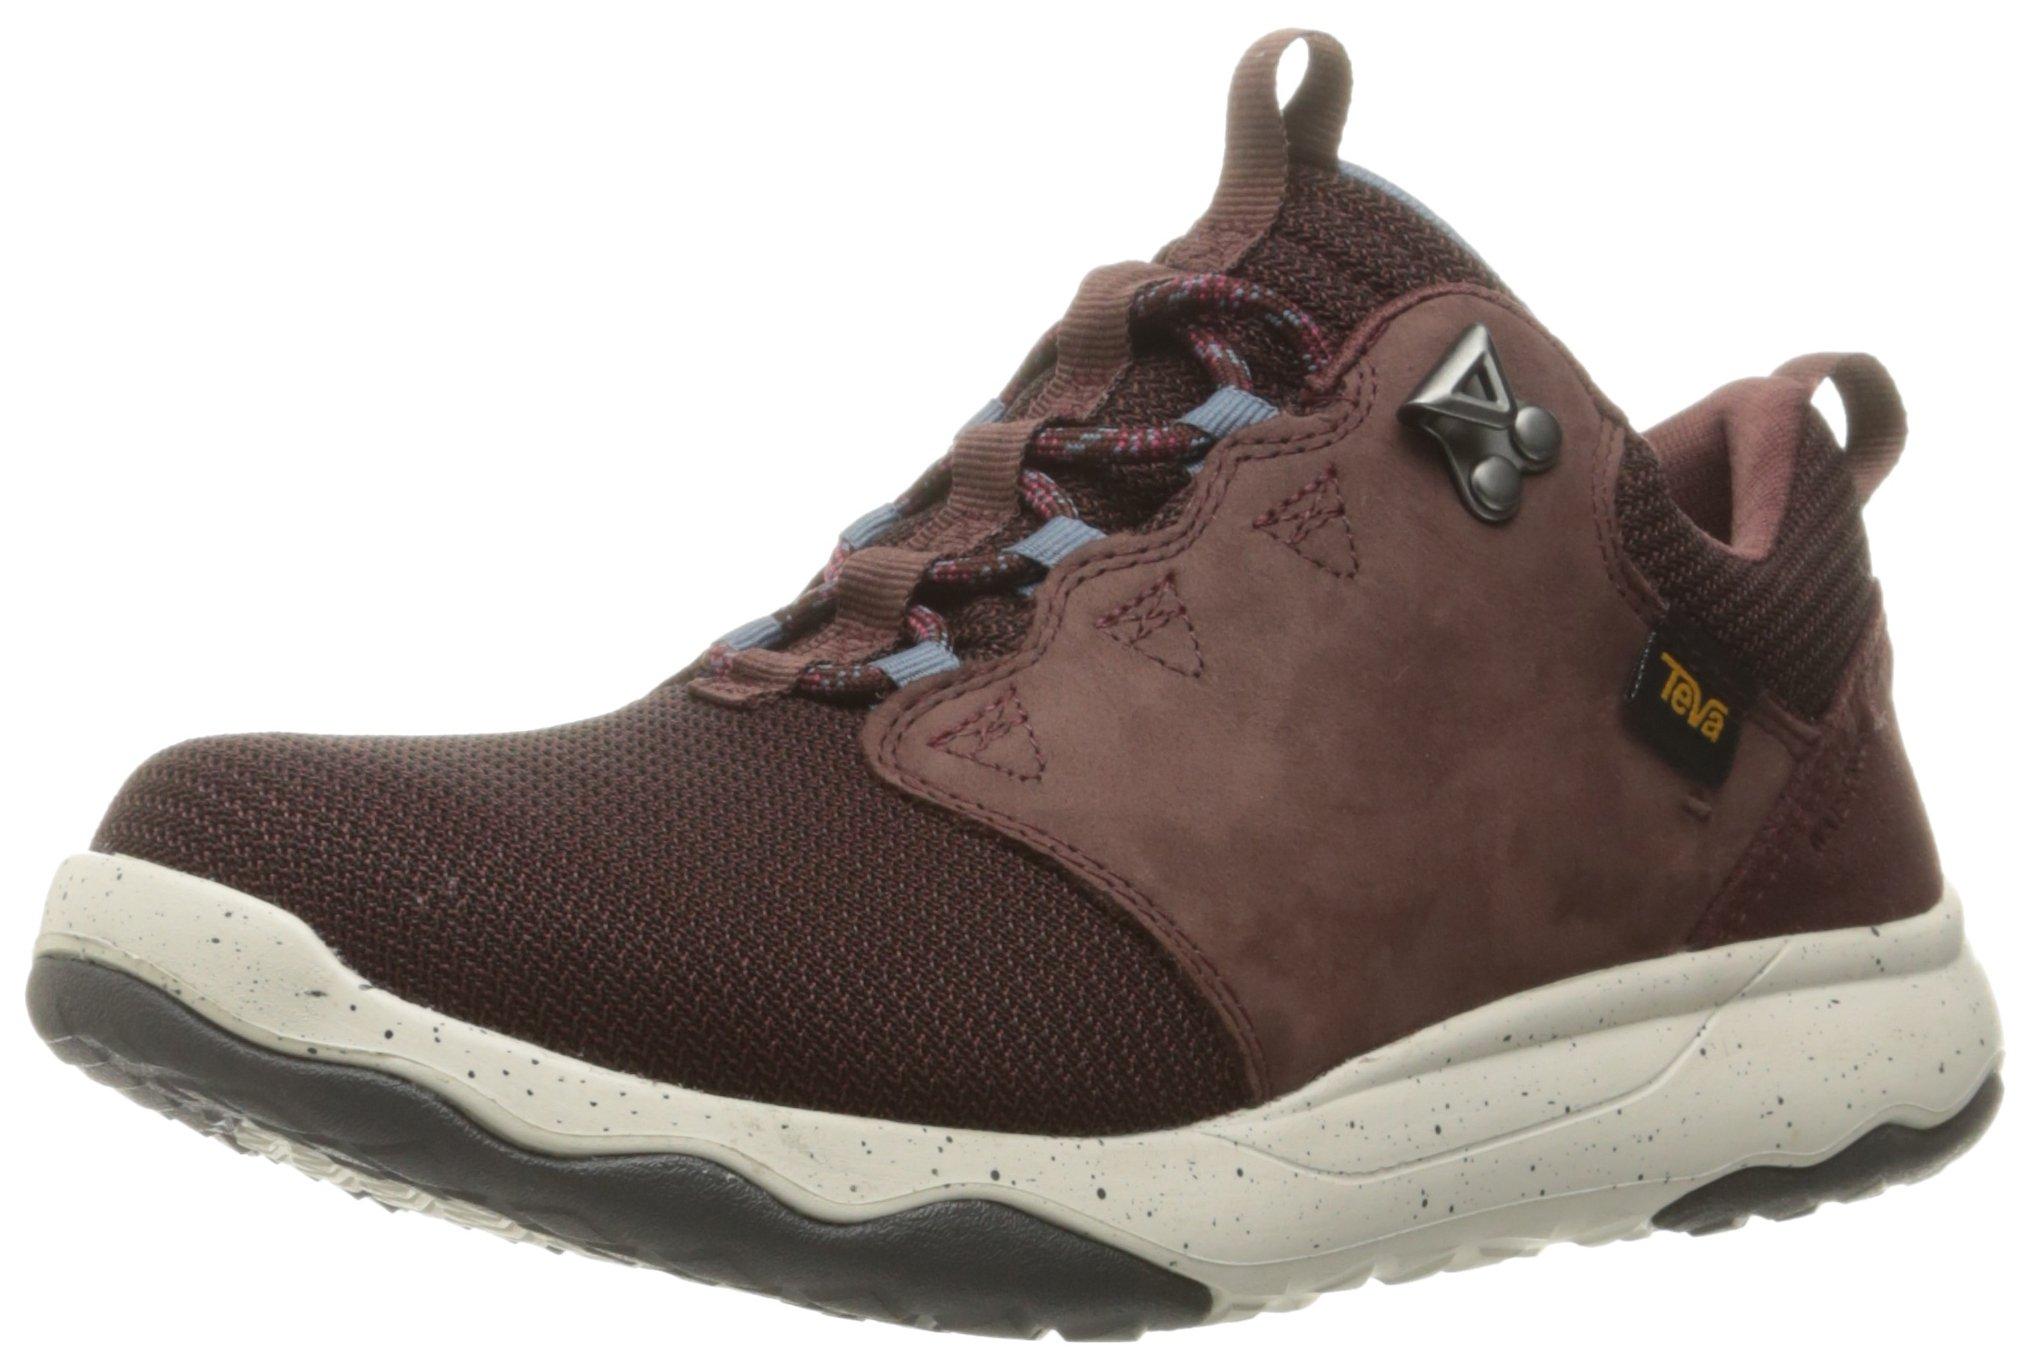 Teva Women's W Arrowood Waterproof Hiking Shoe, Mahogany, 11 M US